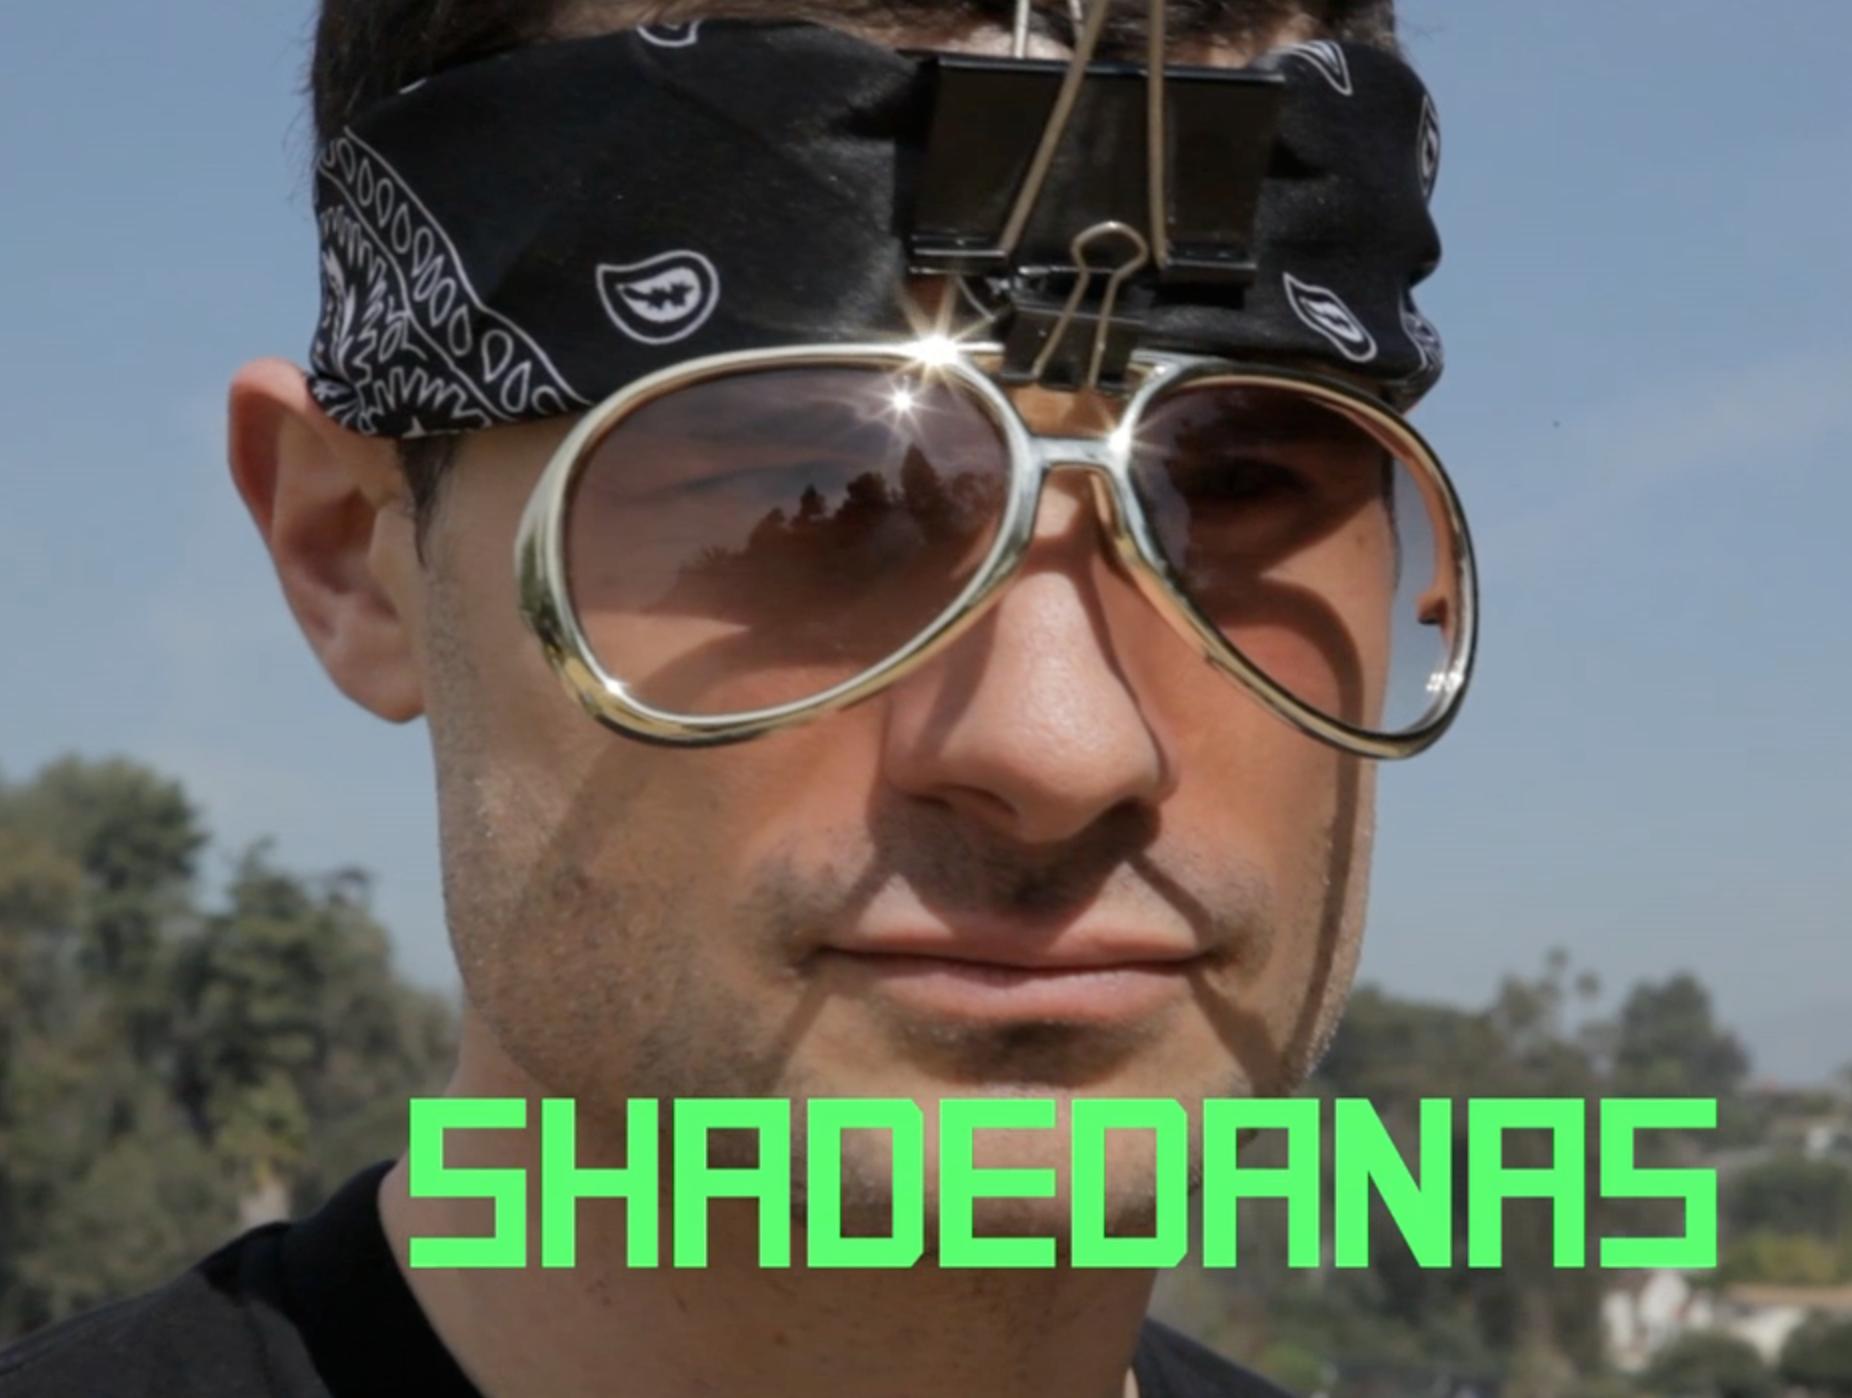 SHADEDANAS